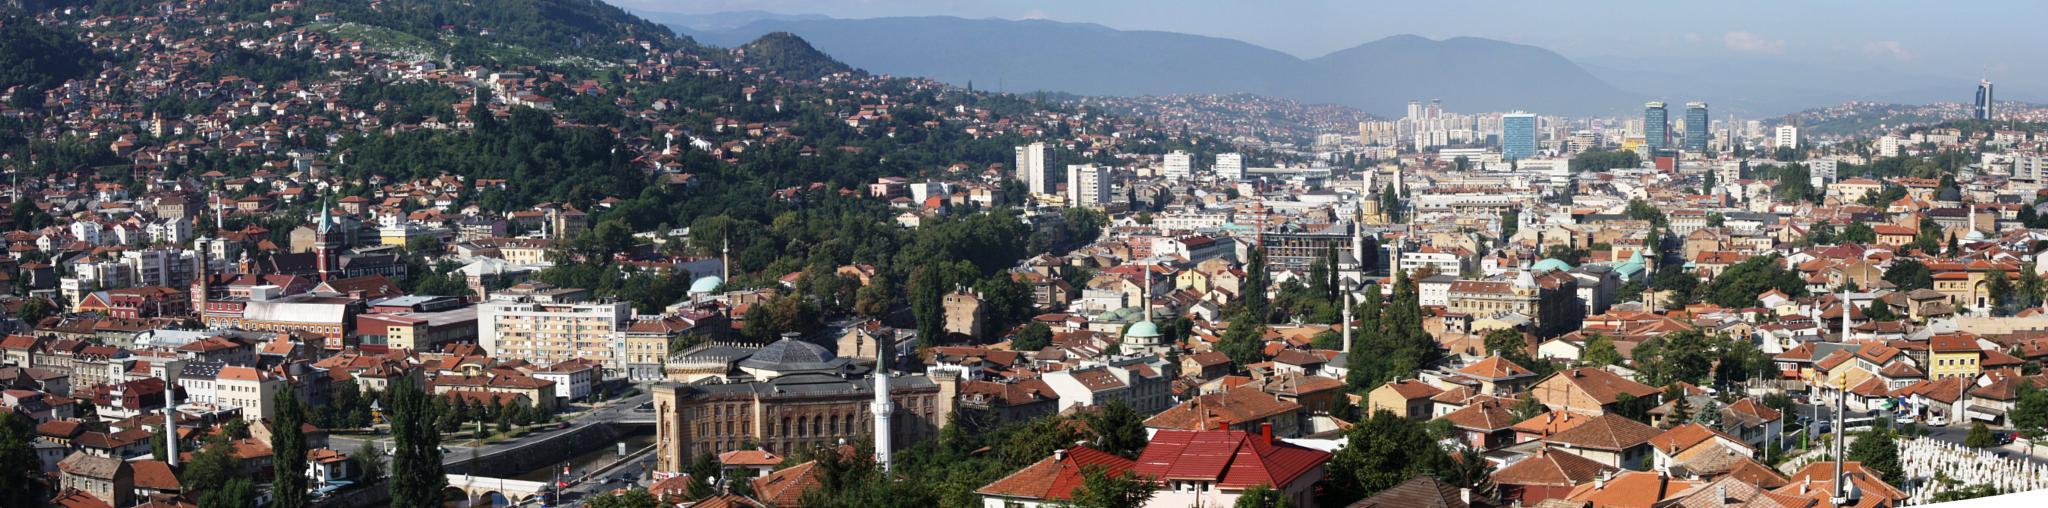 panoramica a Sarajevo by renzo.arena.5